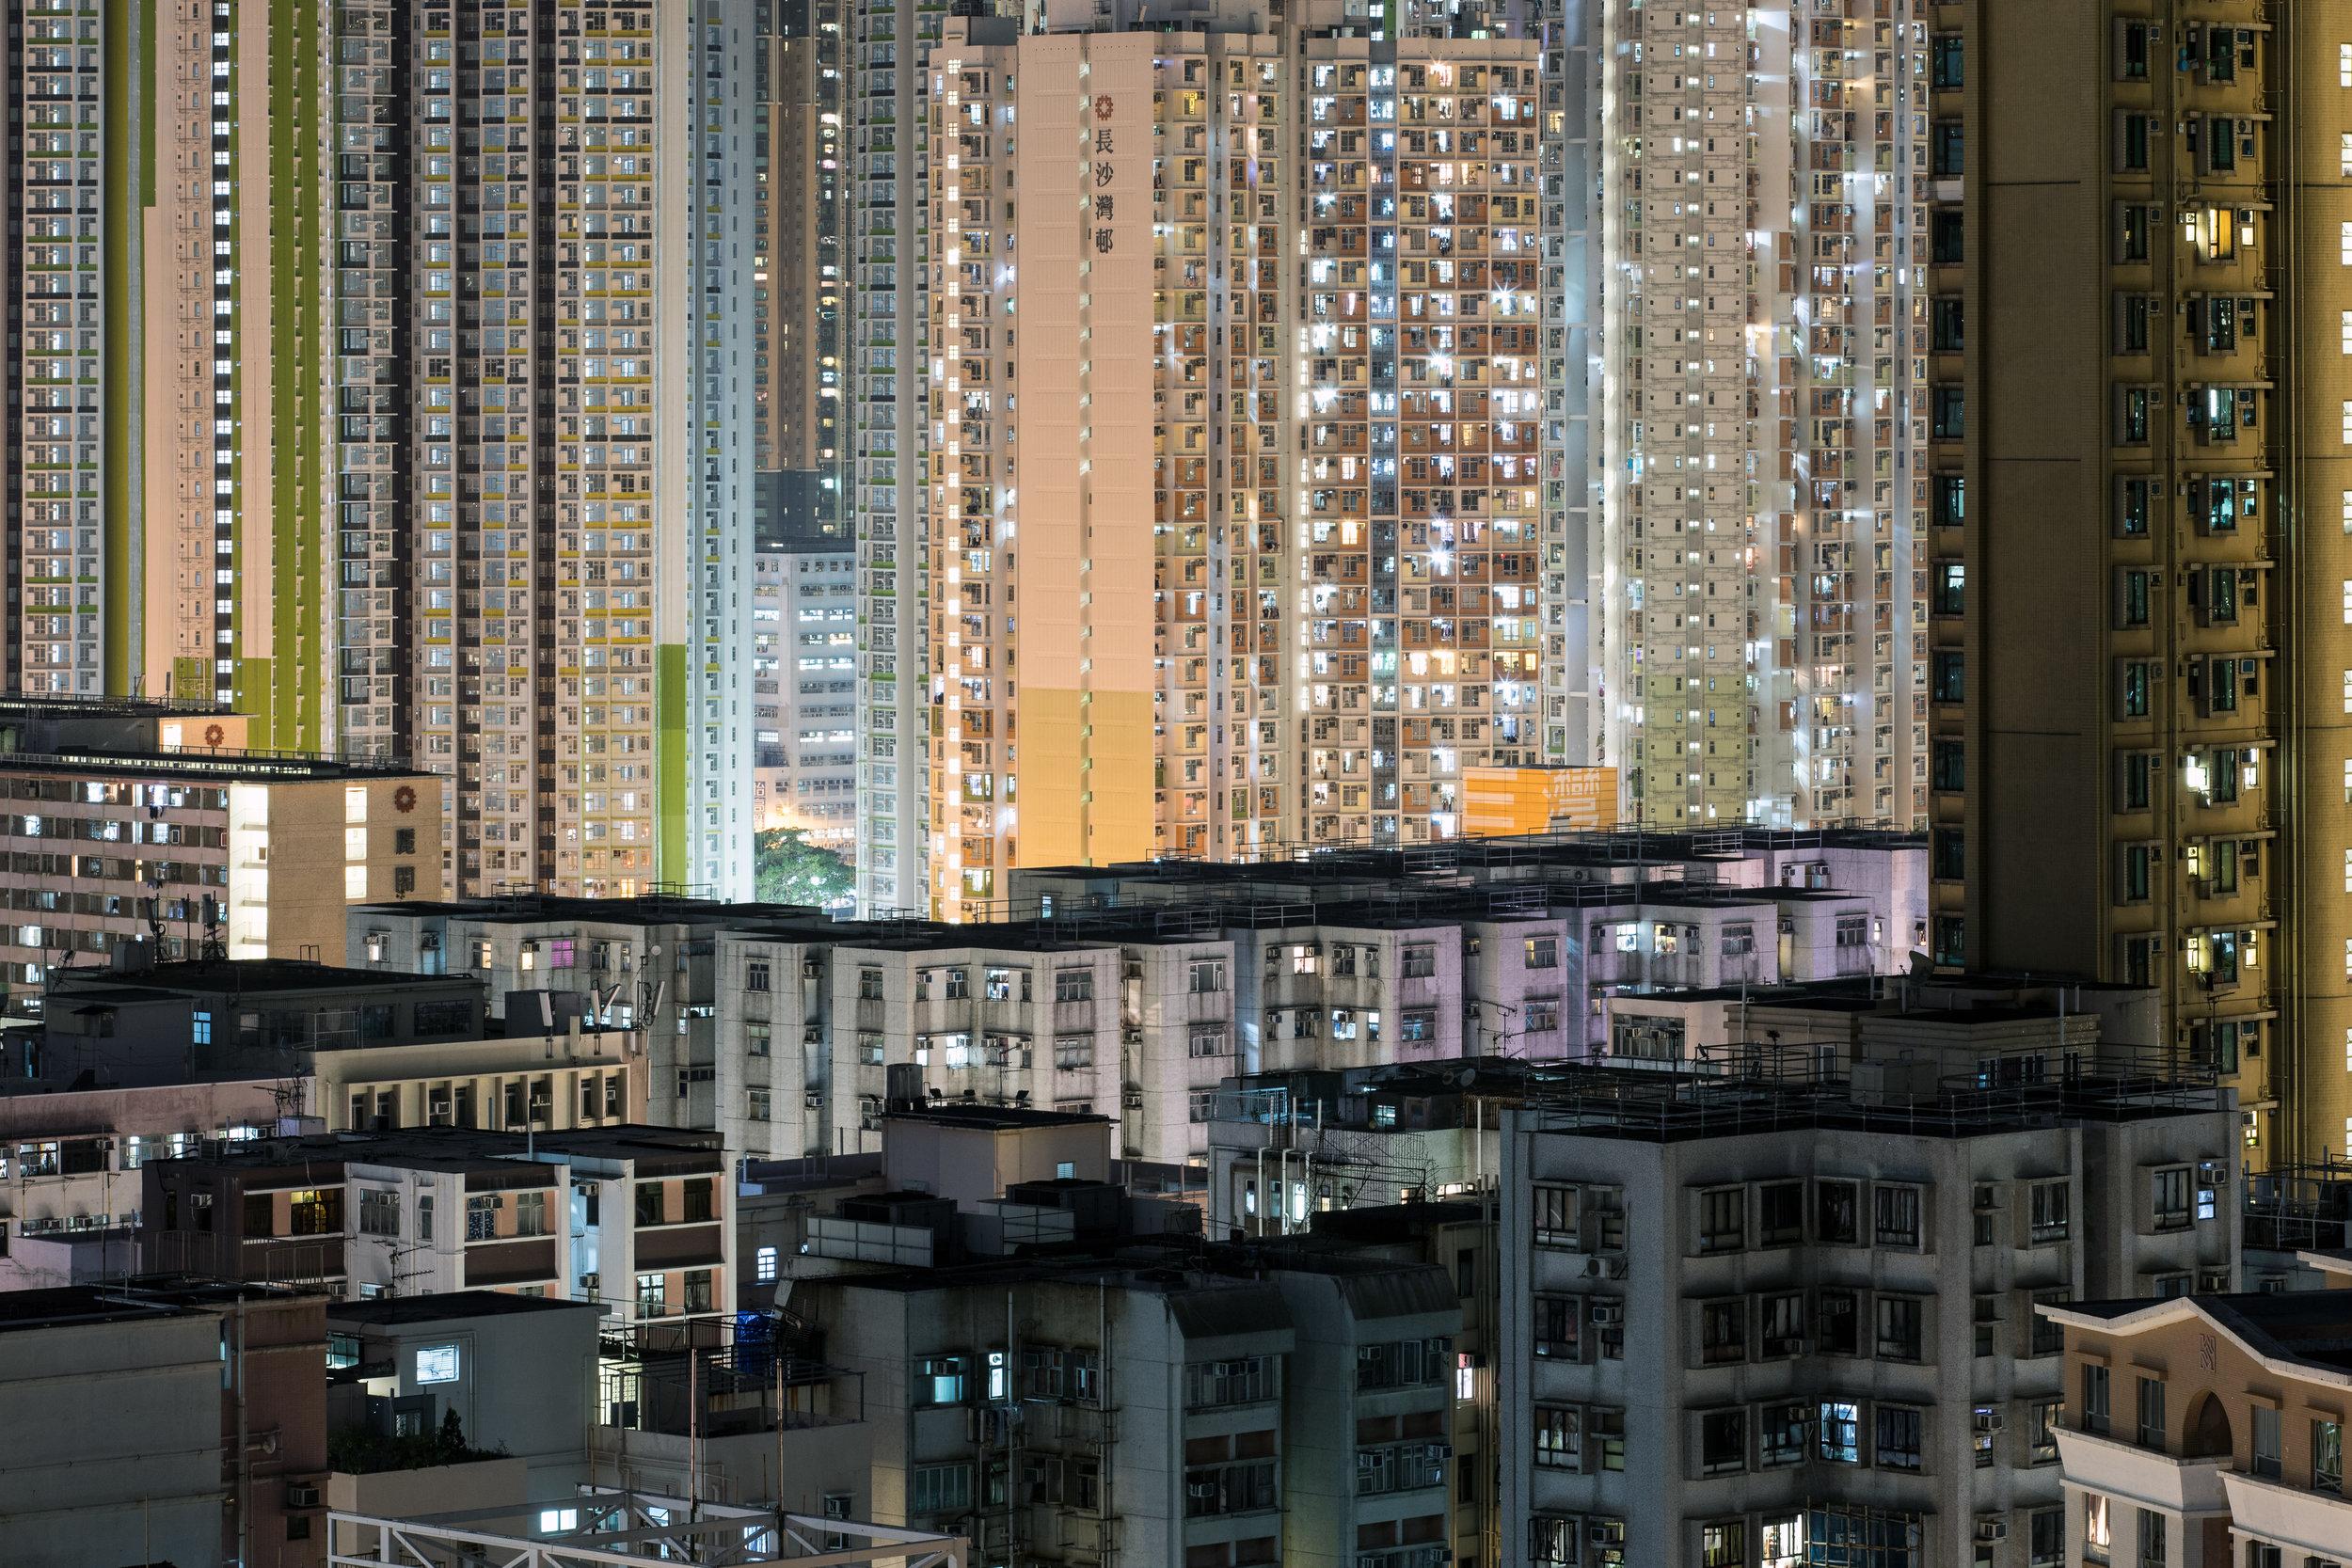 UrbanVerticality_AM.jpg